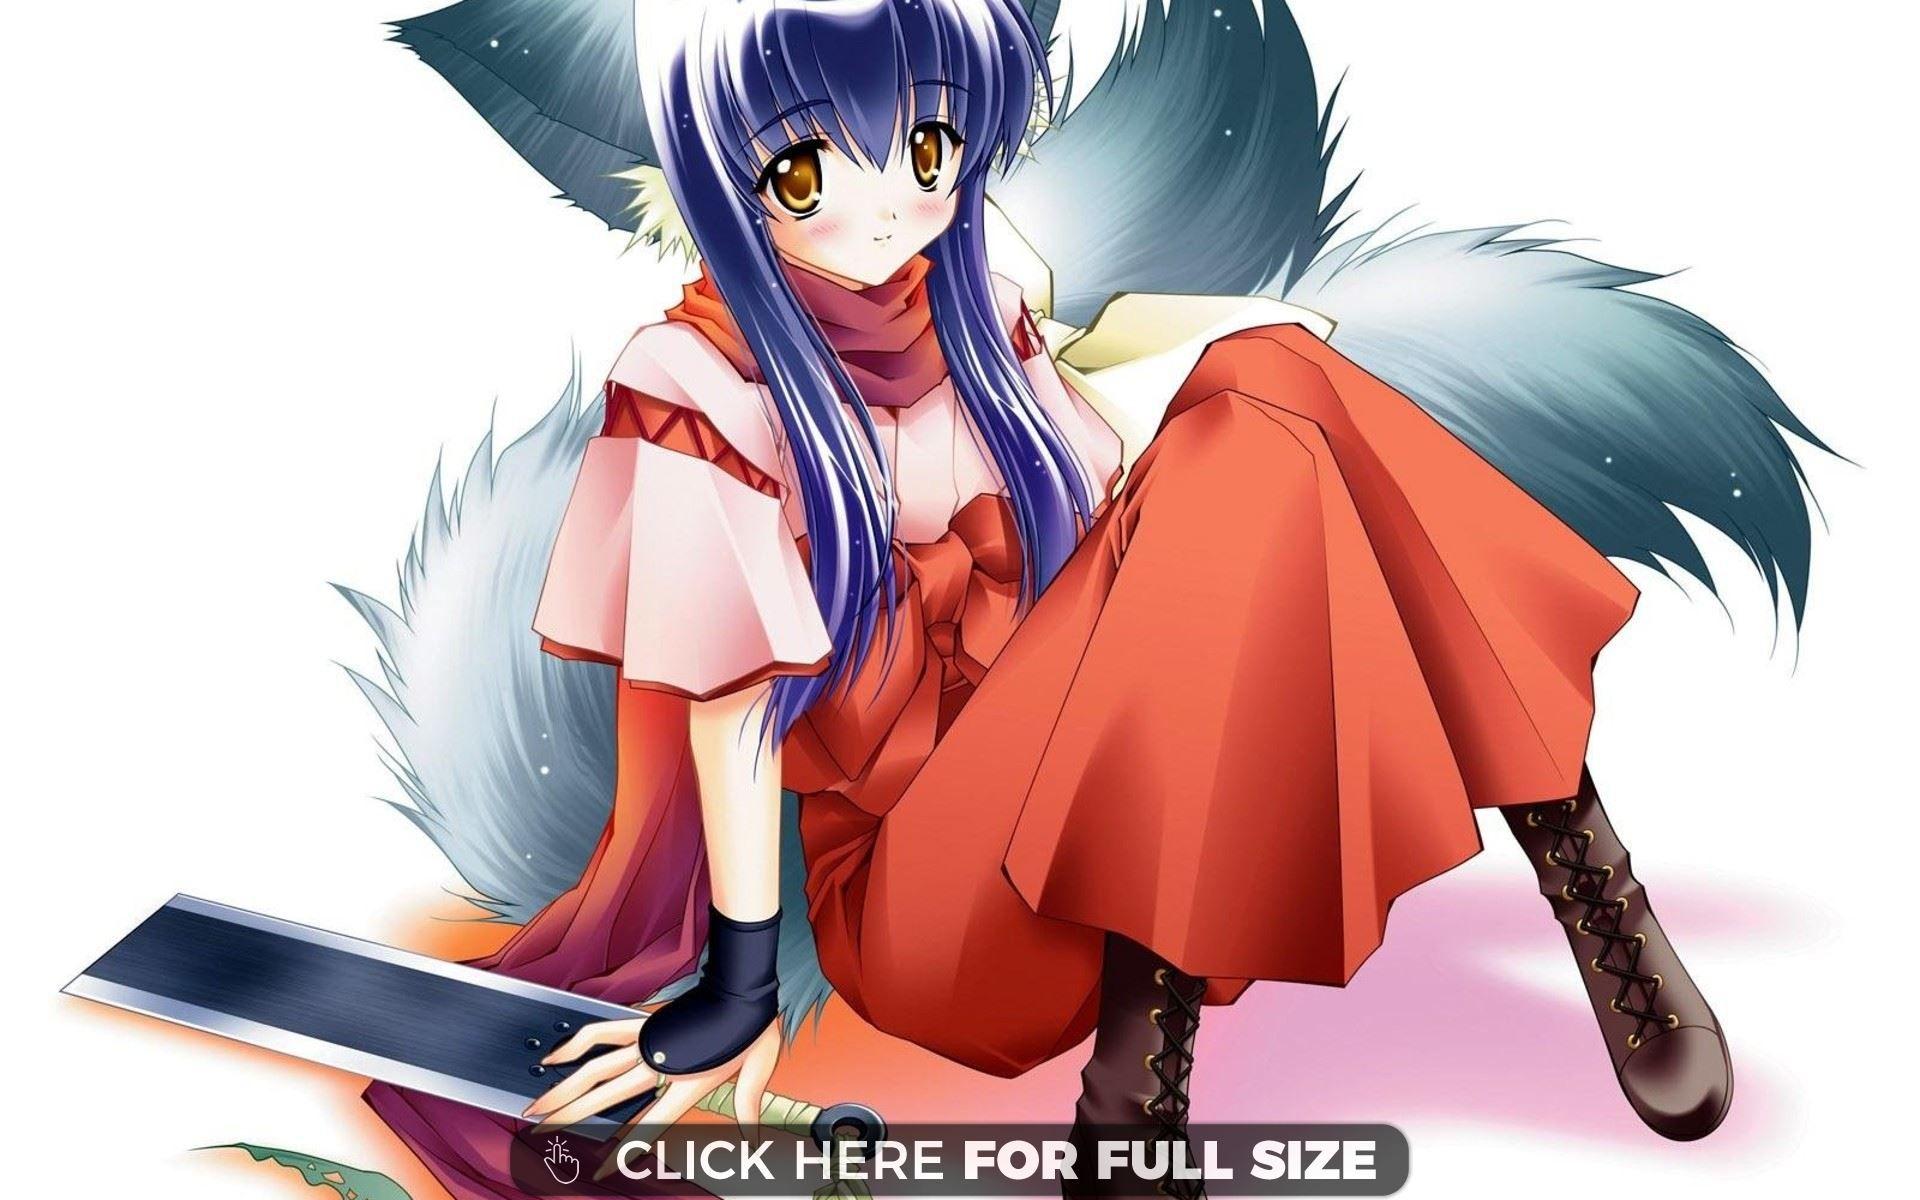 Anime Wolf Girl Wallpaper Desktop Wallpapers Anime Anime Wolf